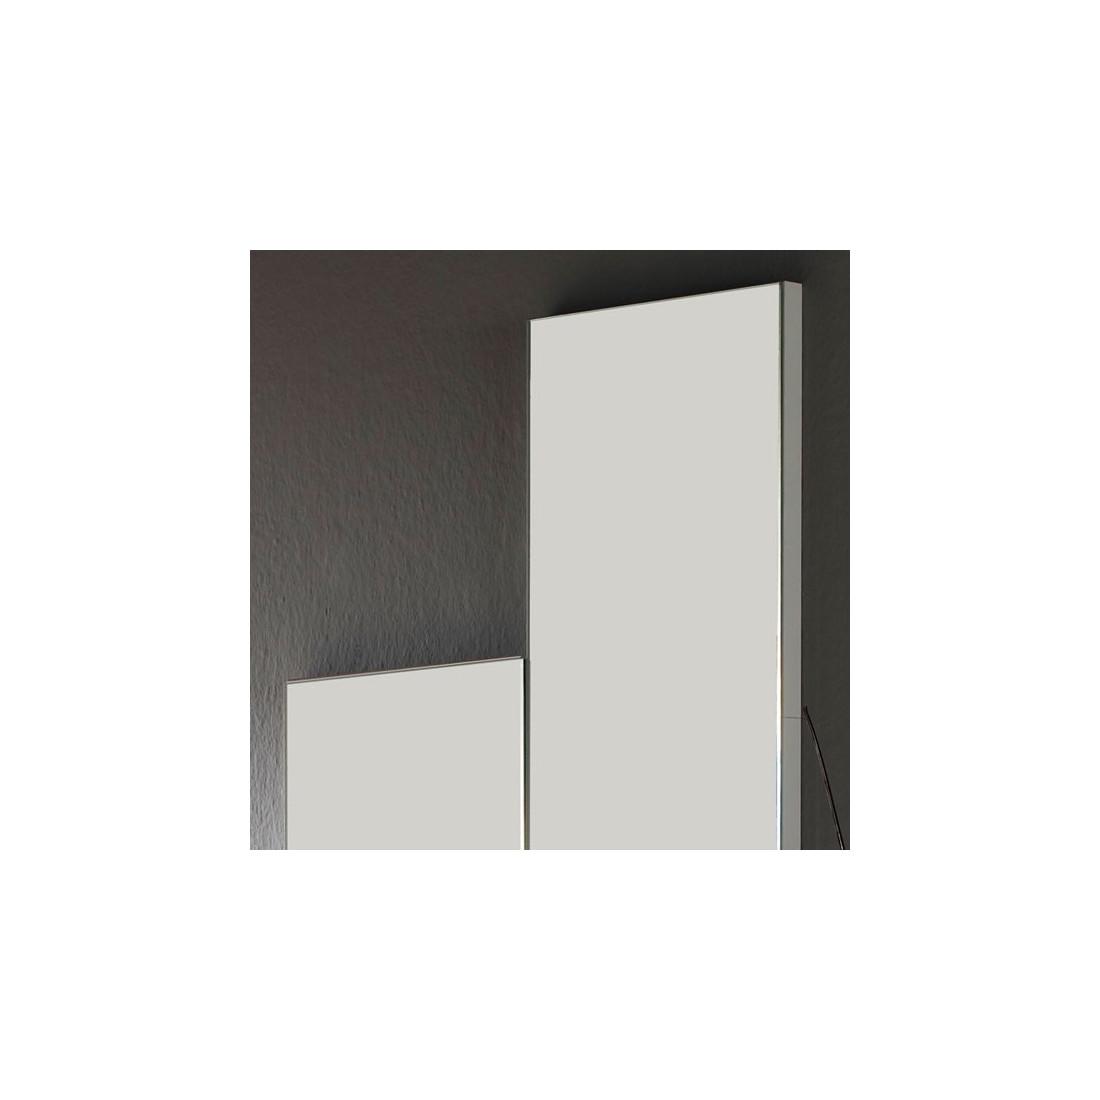 Miroir Bois Clair : blanc ch?ne clair miroir nyla meuble d entr?e suspendu miroir